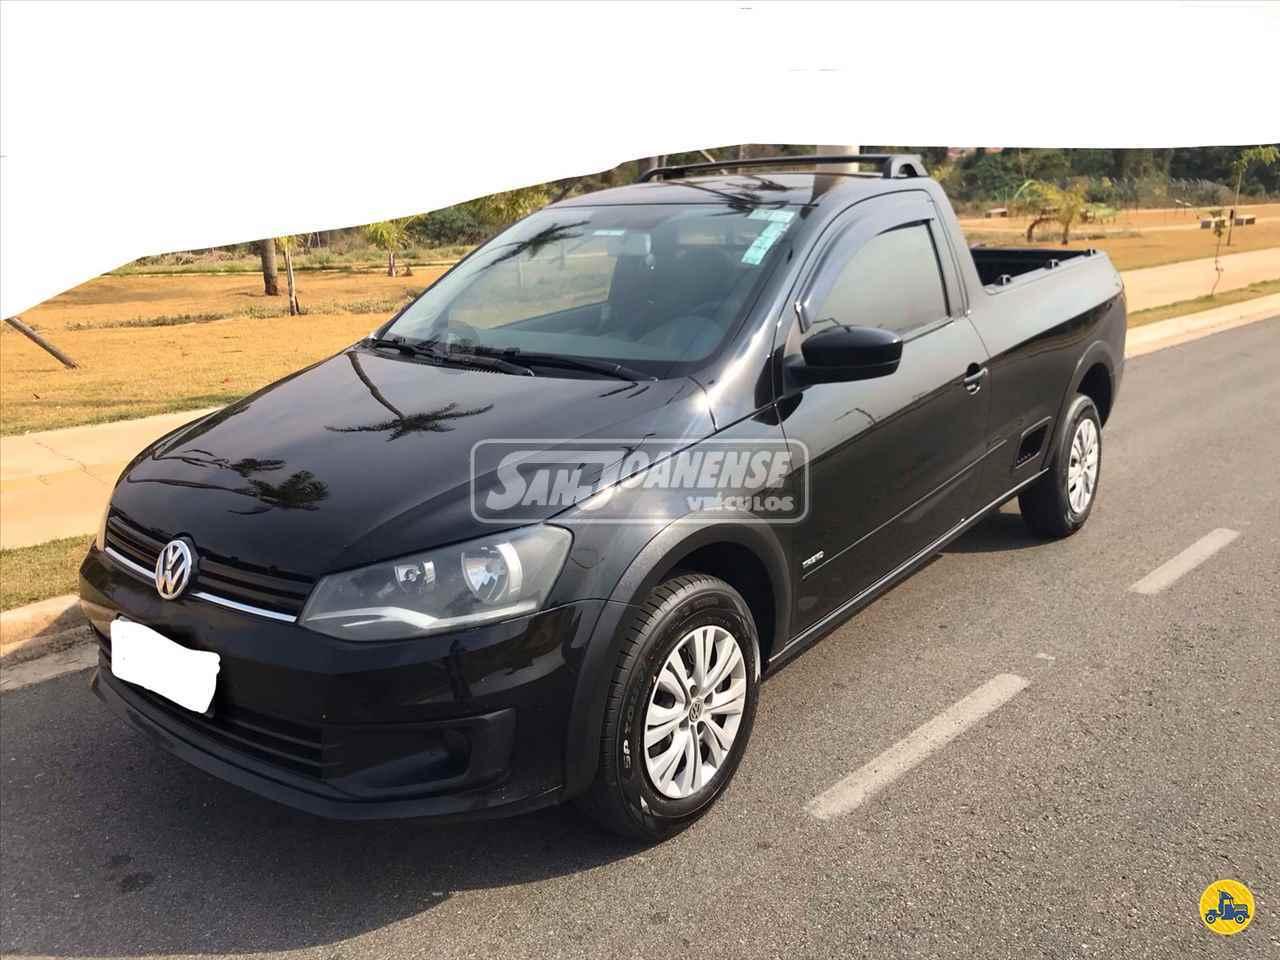 CARRO VW - Volkswagen Saveiro 1.6 Trend Sanjoanense Veículos SAO JOAO DA BOA VISTA SÃO PAULO SP